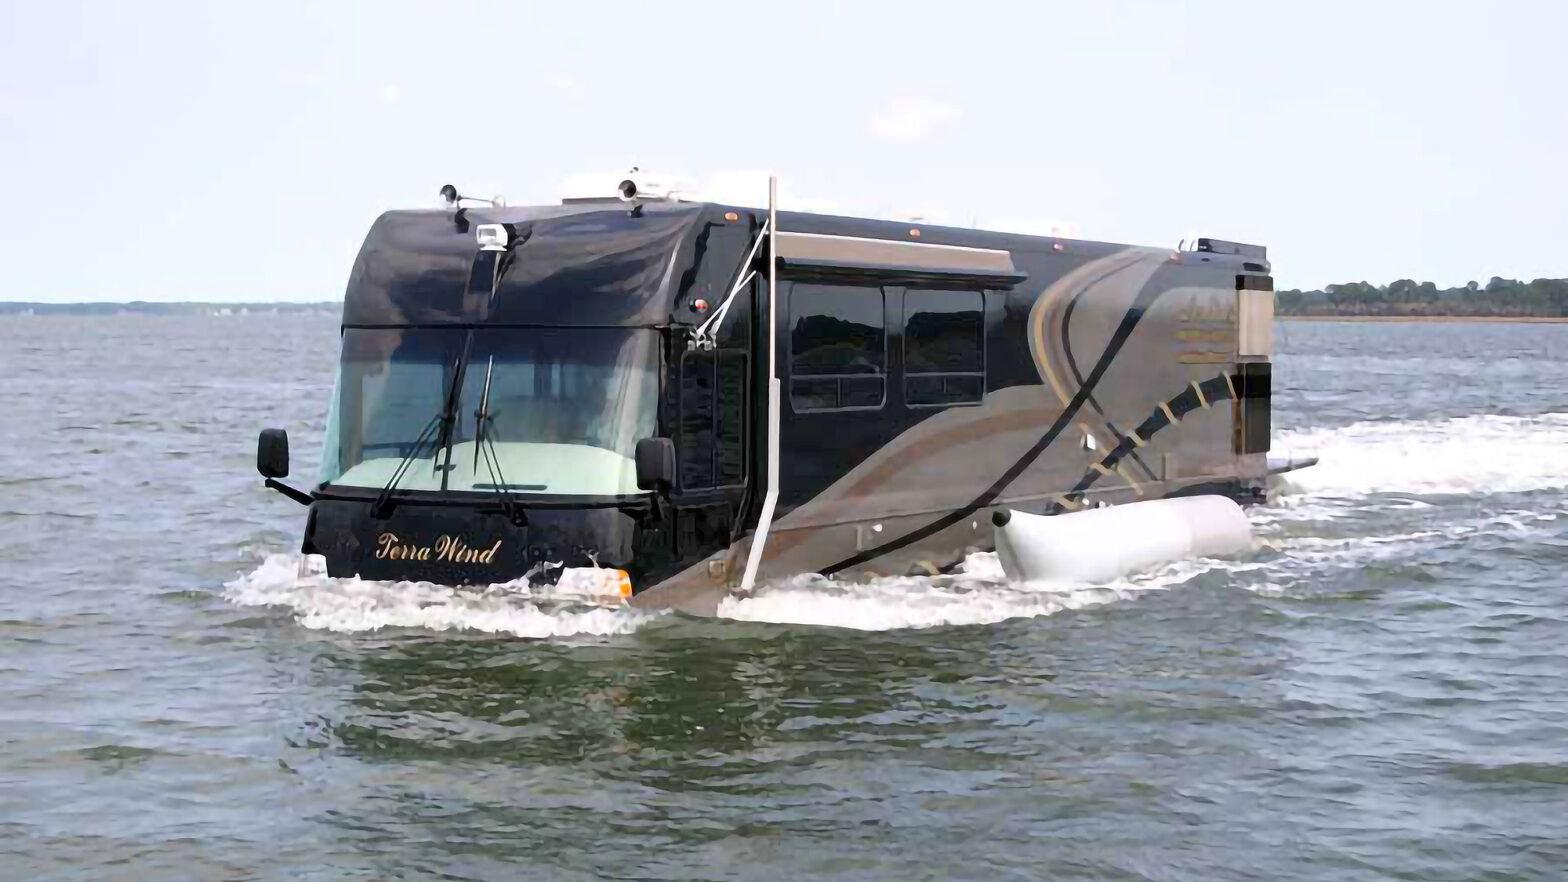 Terra Wind Amphibious Motor Coach